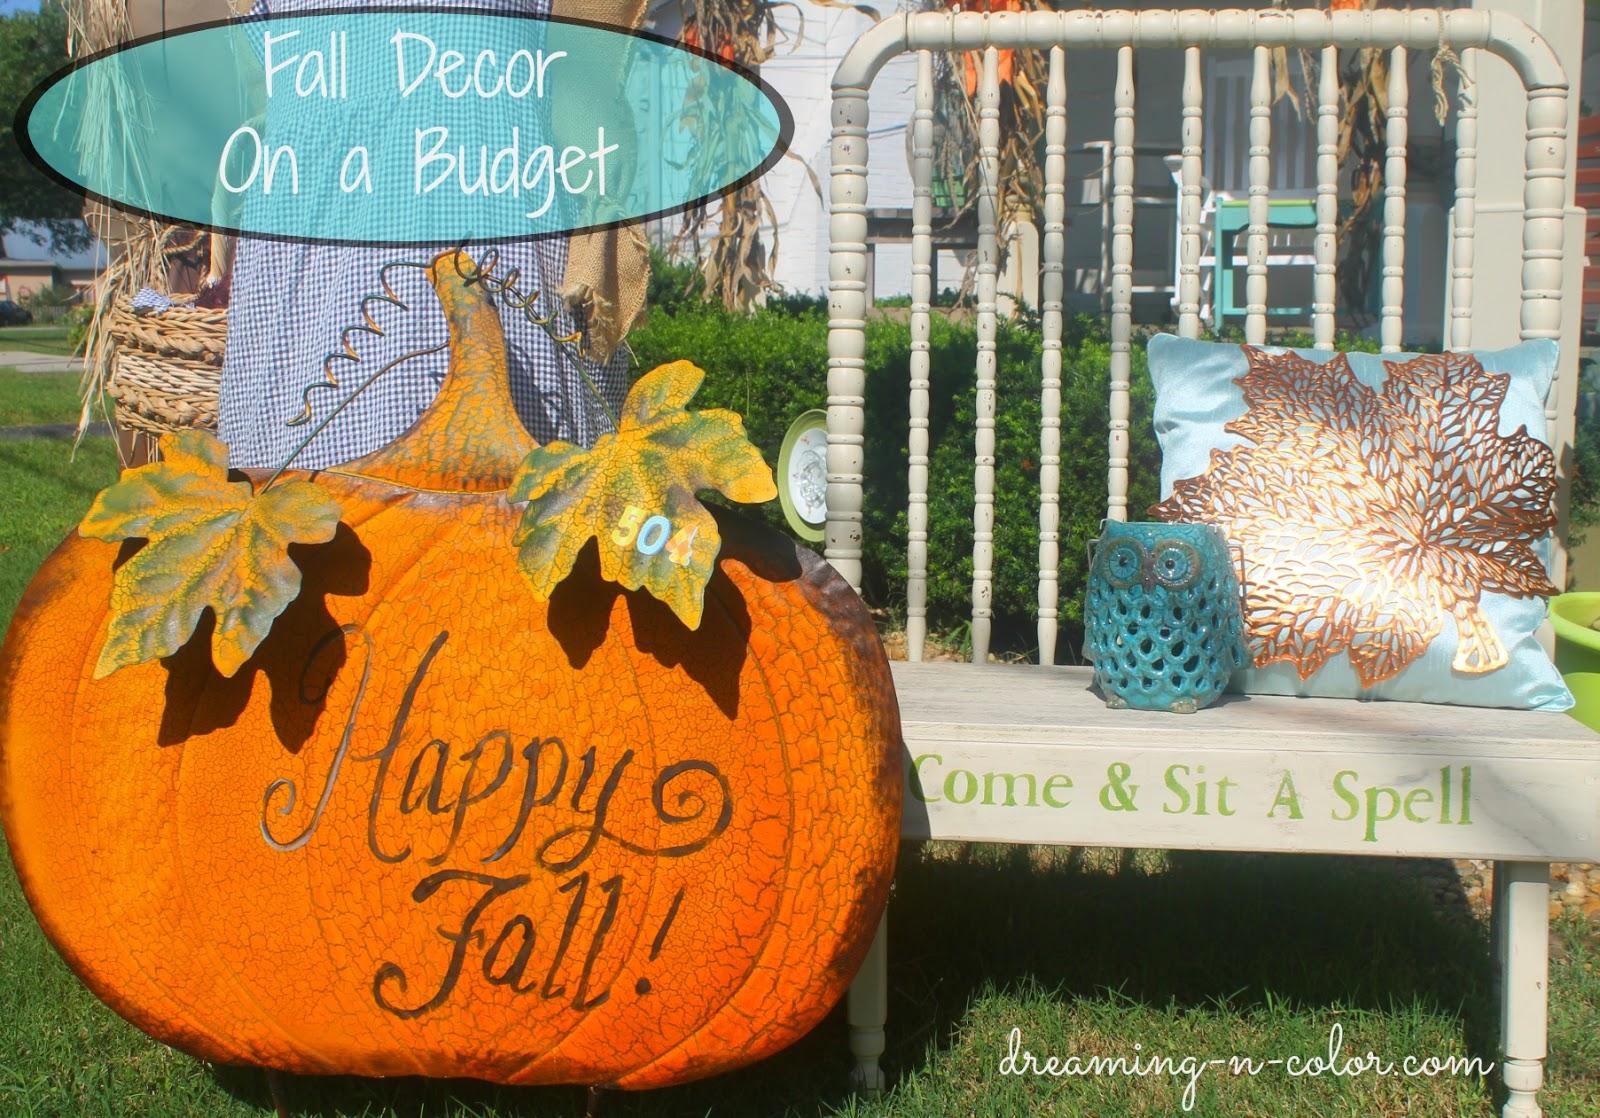 dreamingincolor outdoor fall decor on a budget. Black Bedroom Furniture Sets. Home Design Ideas